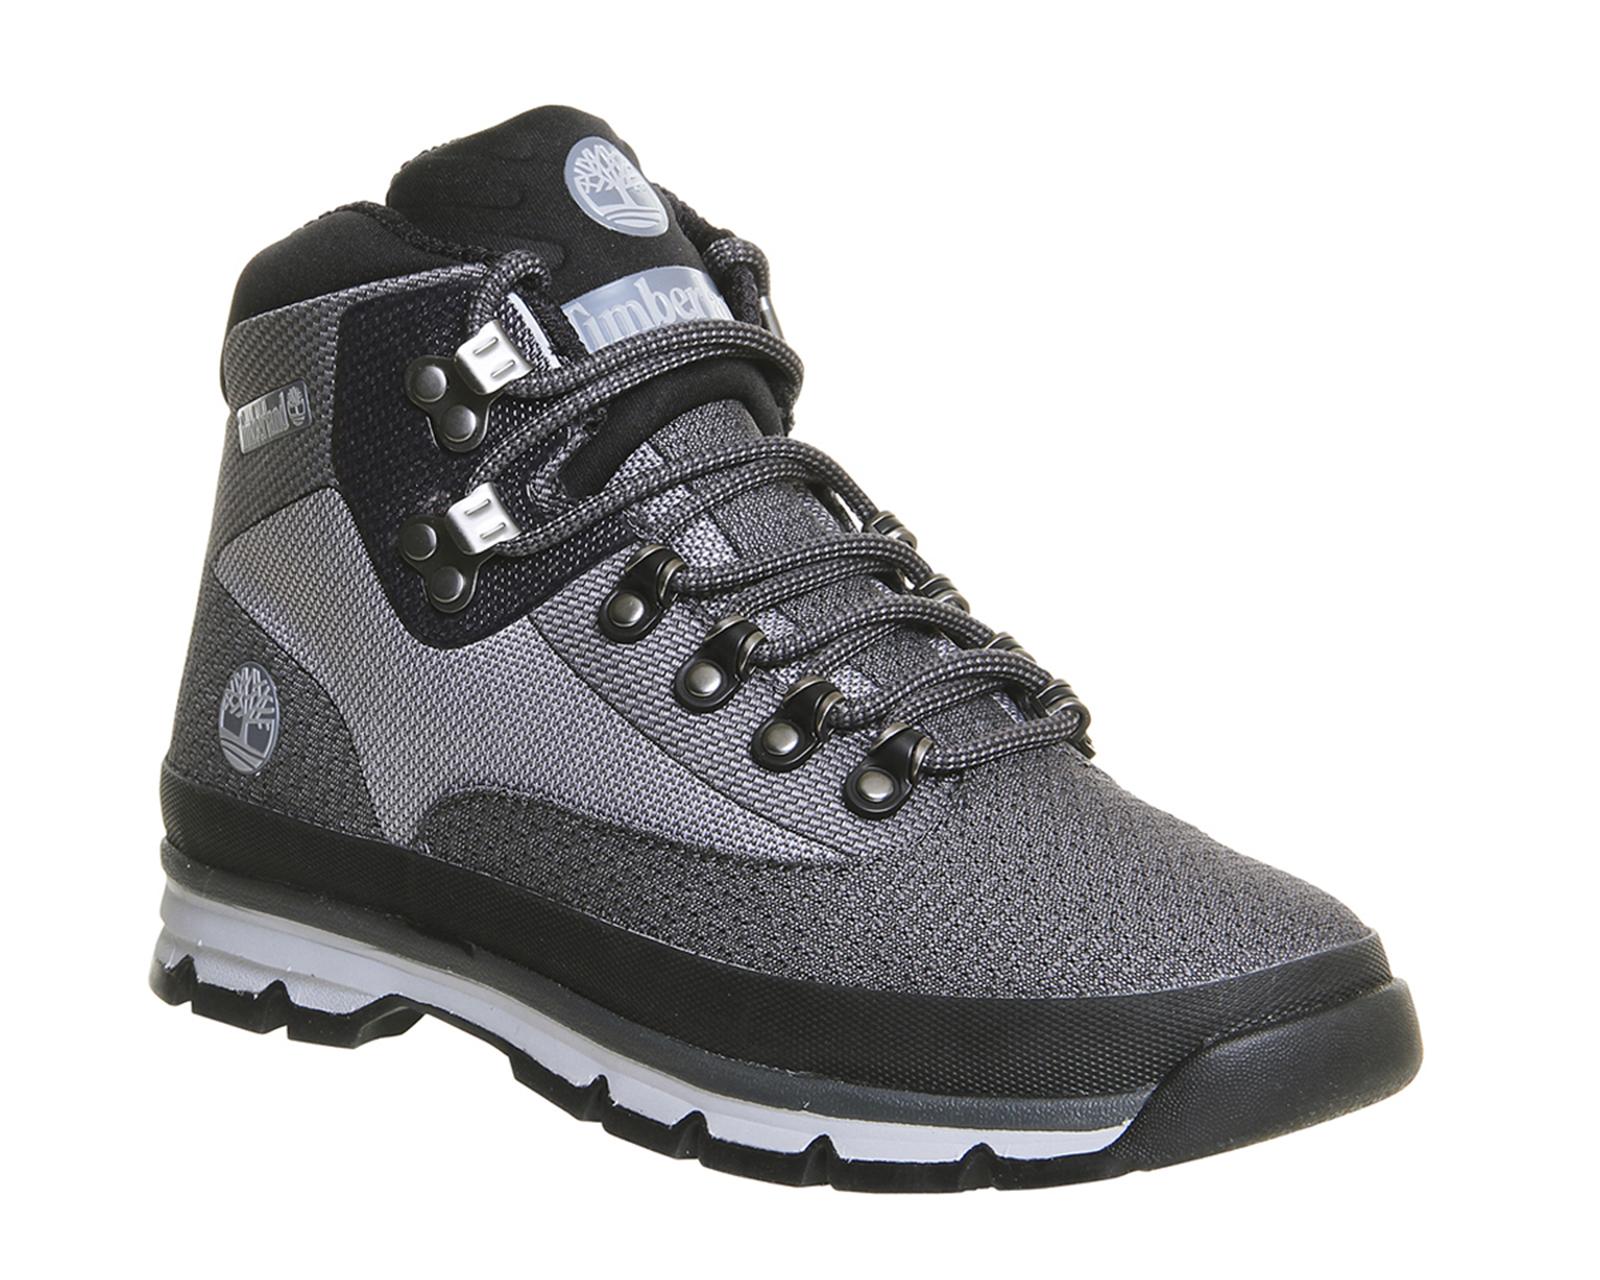 Mens-Timberland-Euro-Hiker-Jacquard-GREY-Boots